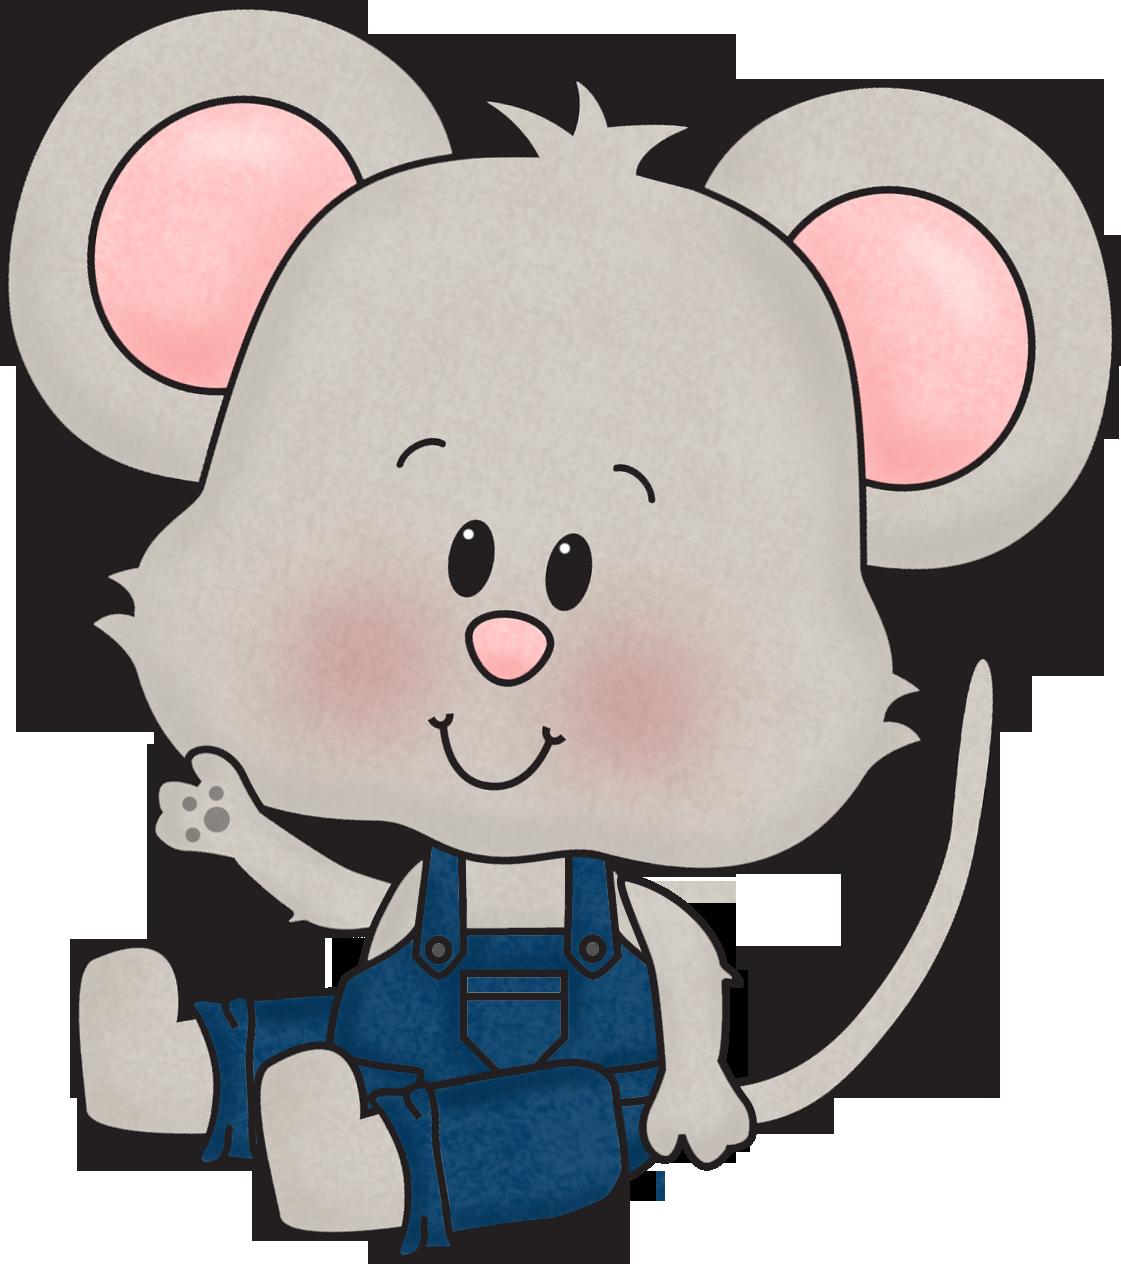 Pie clipart kid. Free farm mouse cliparts